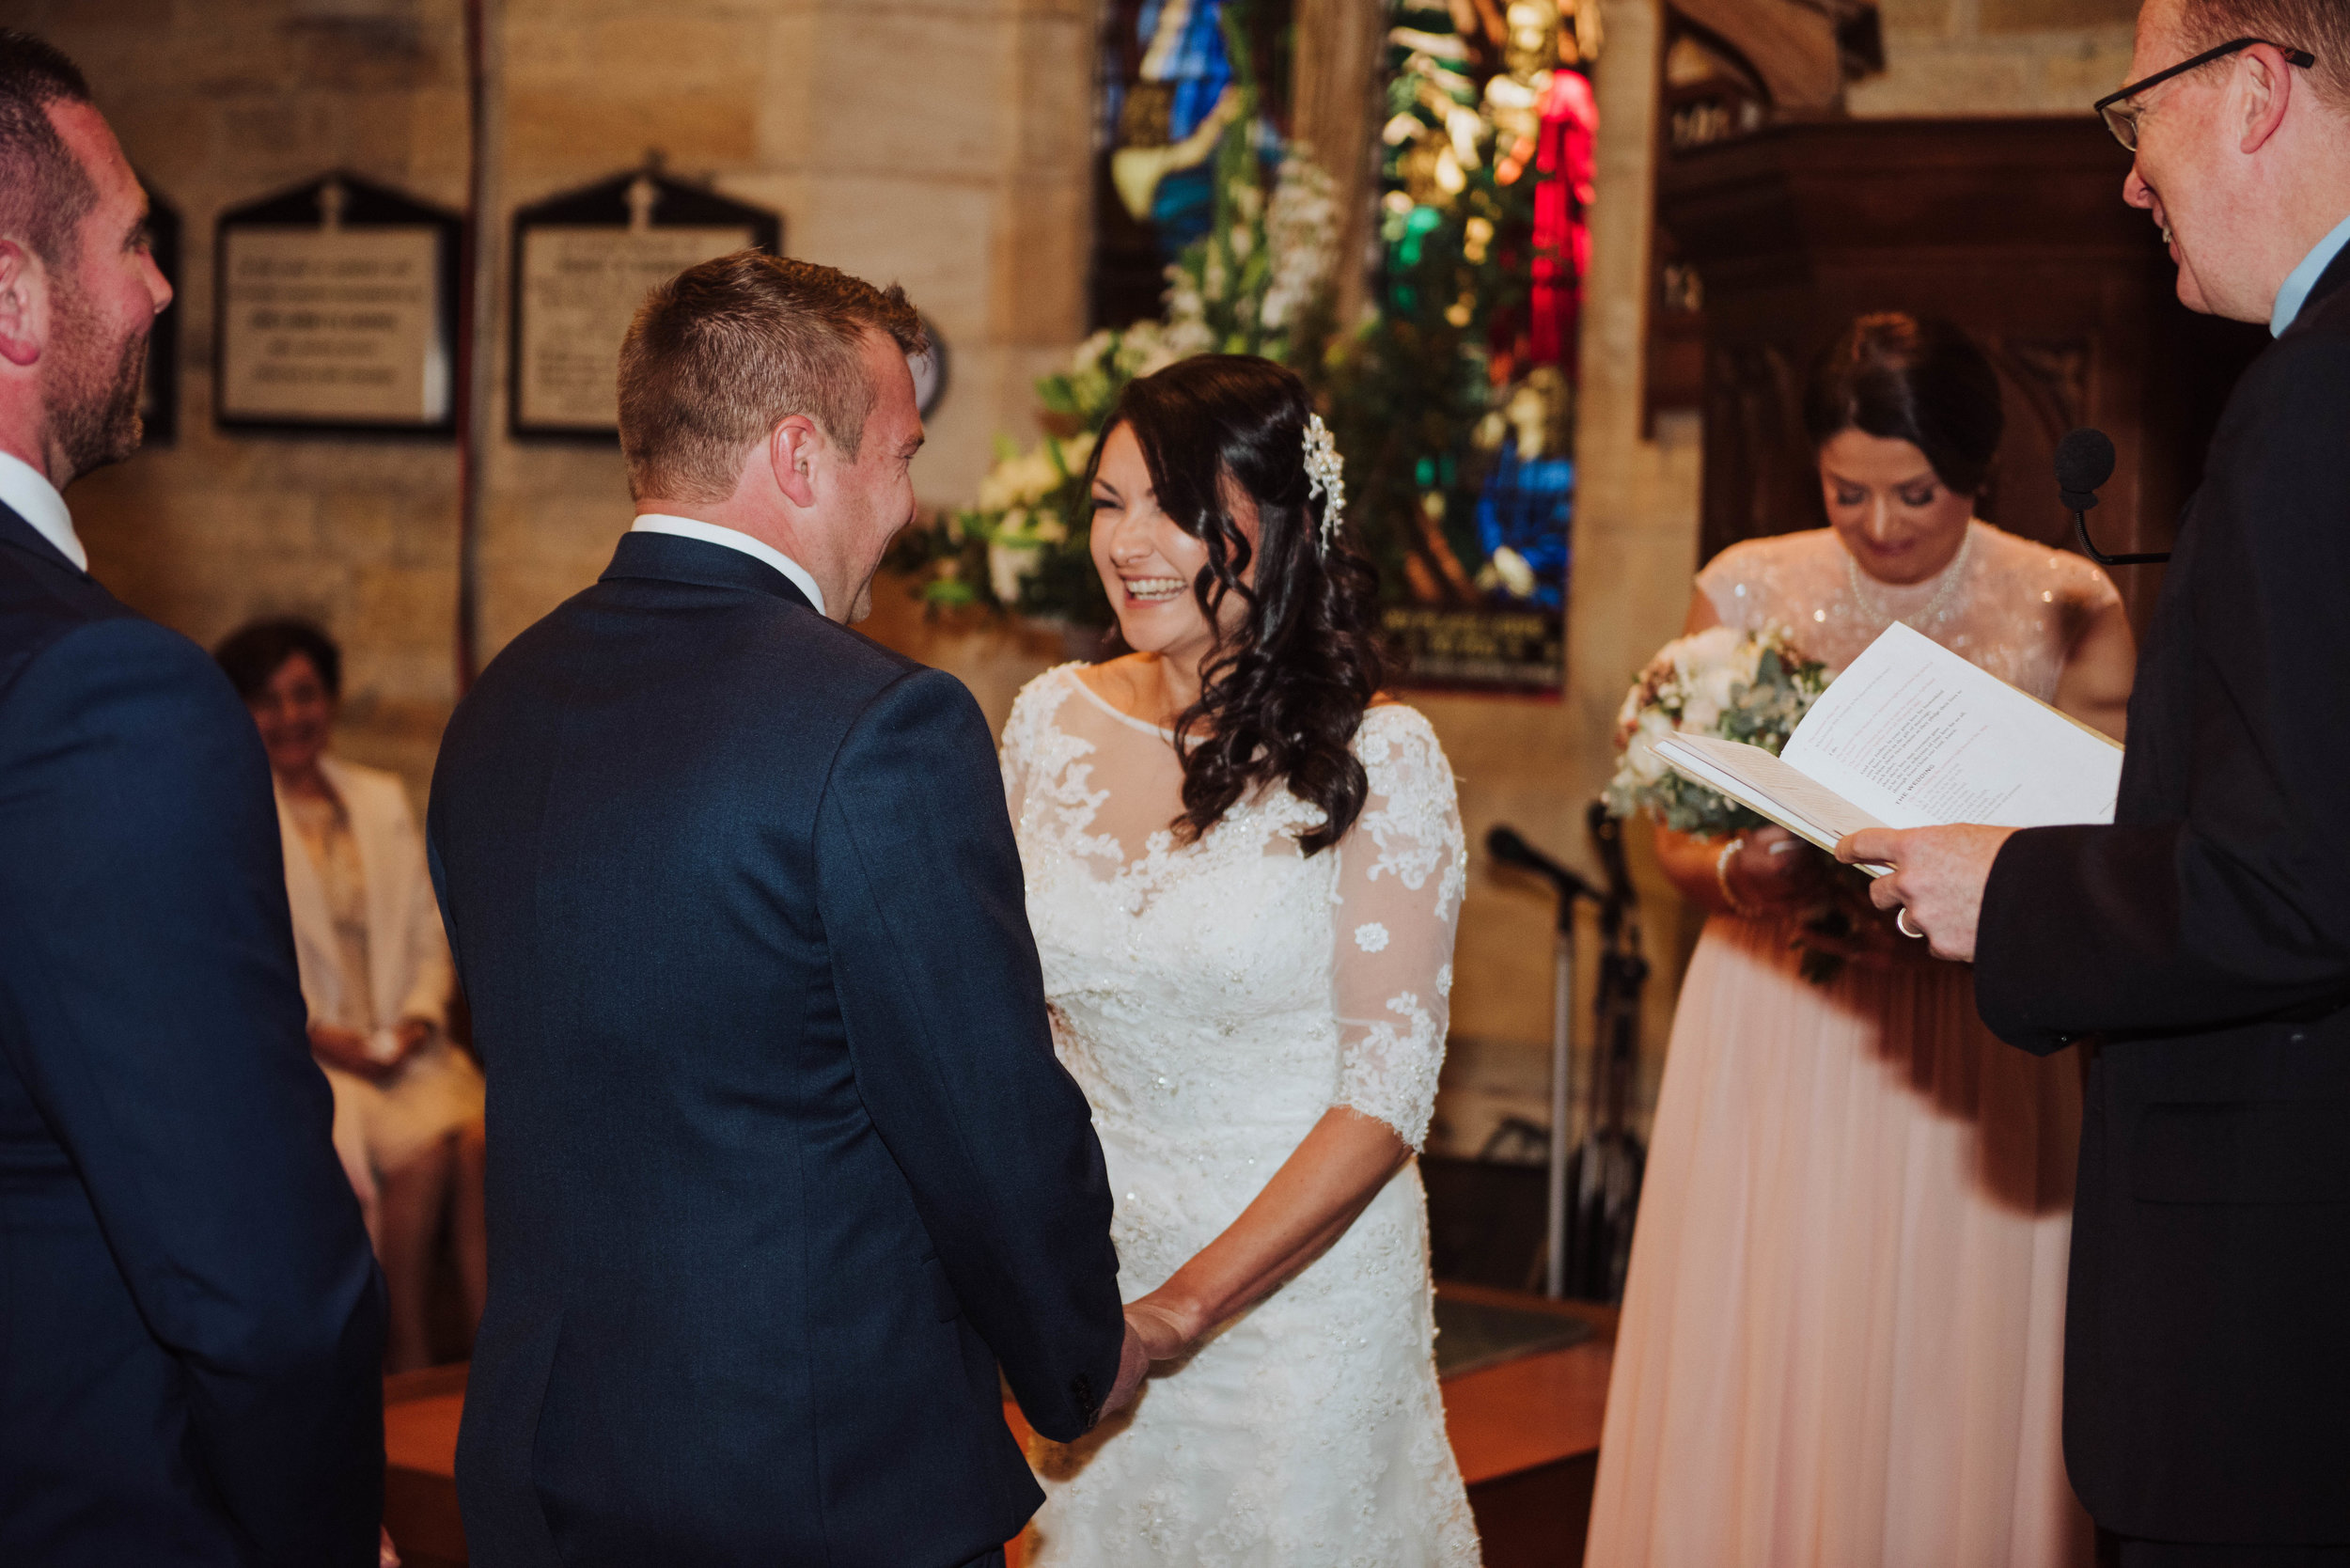 Alice & Matt - Southern Highlands Winter Wedding    15th July 2017